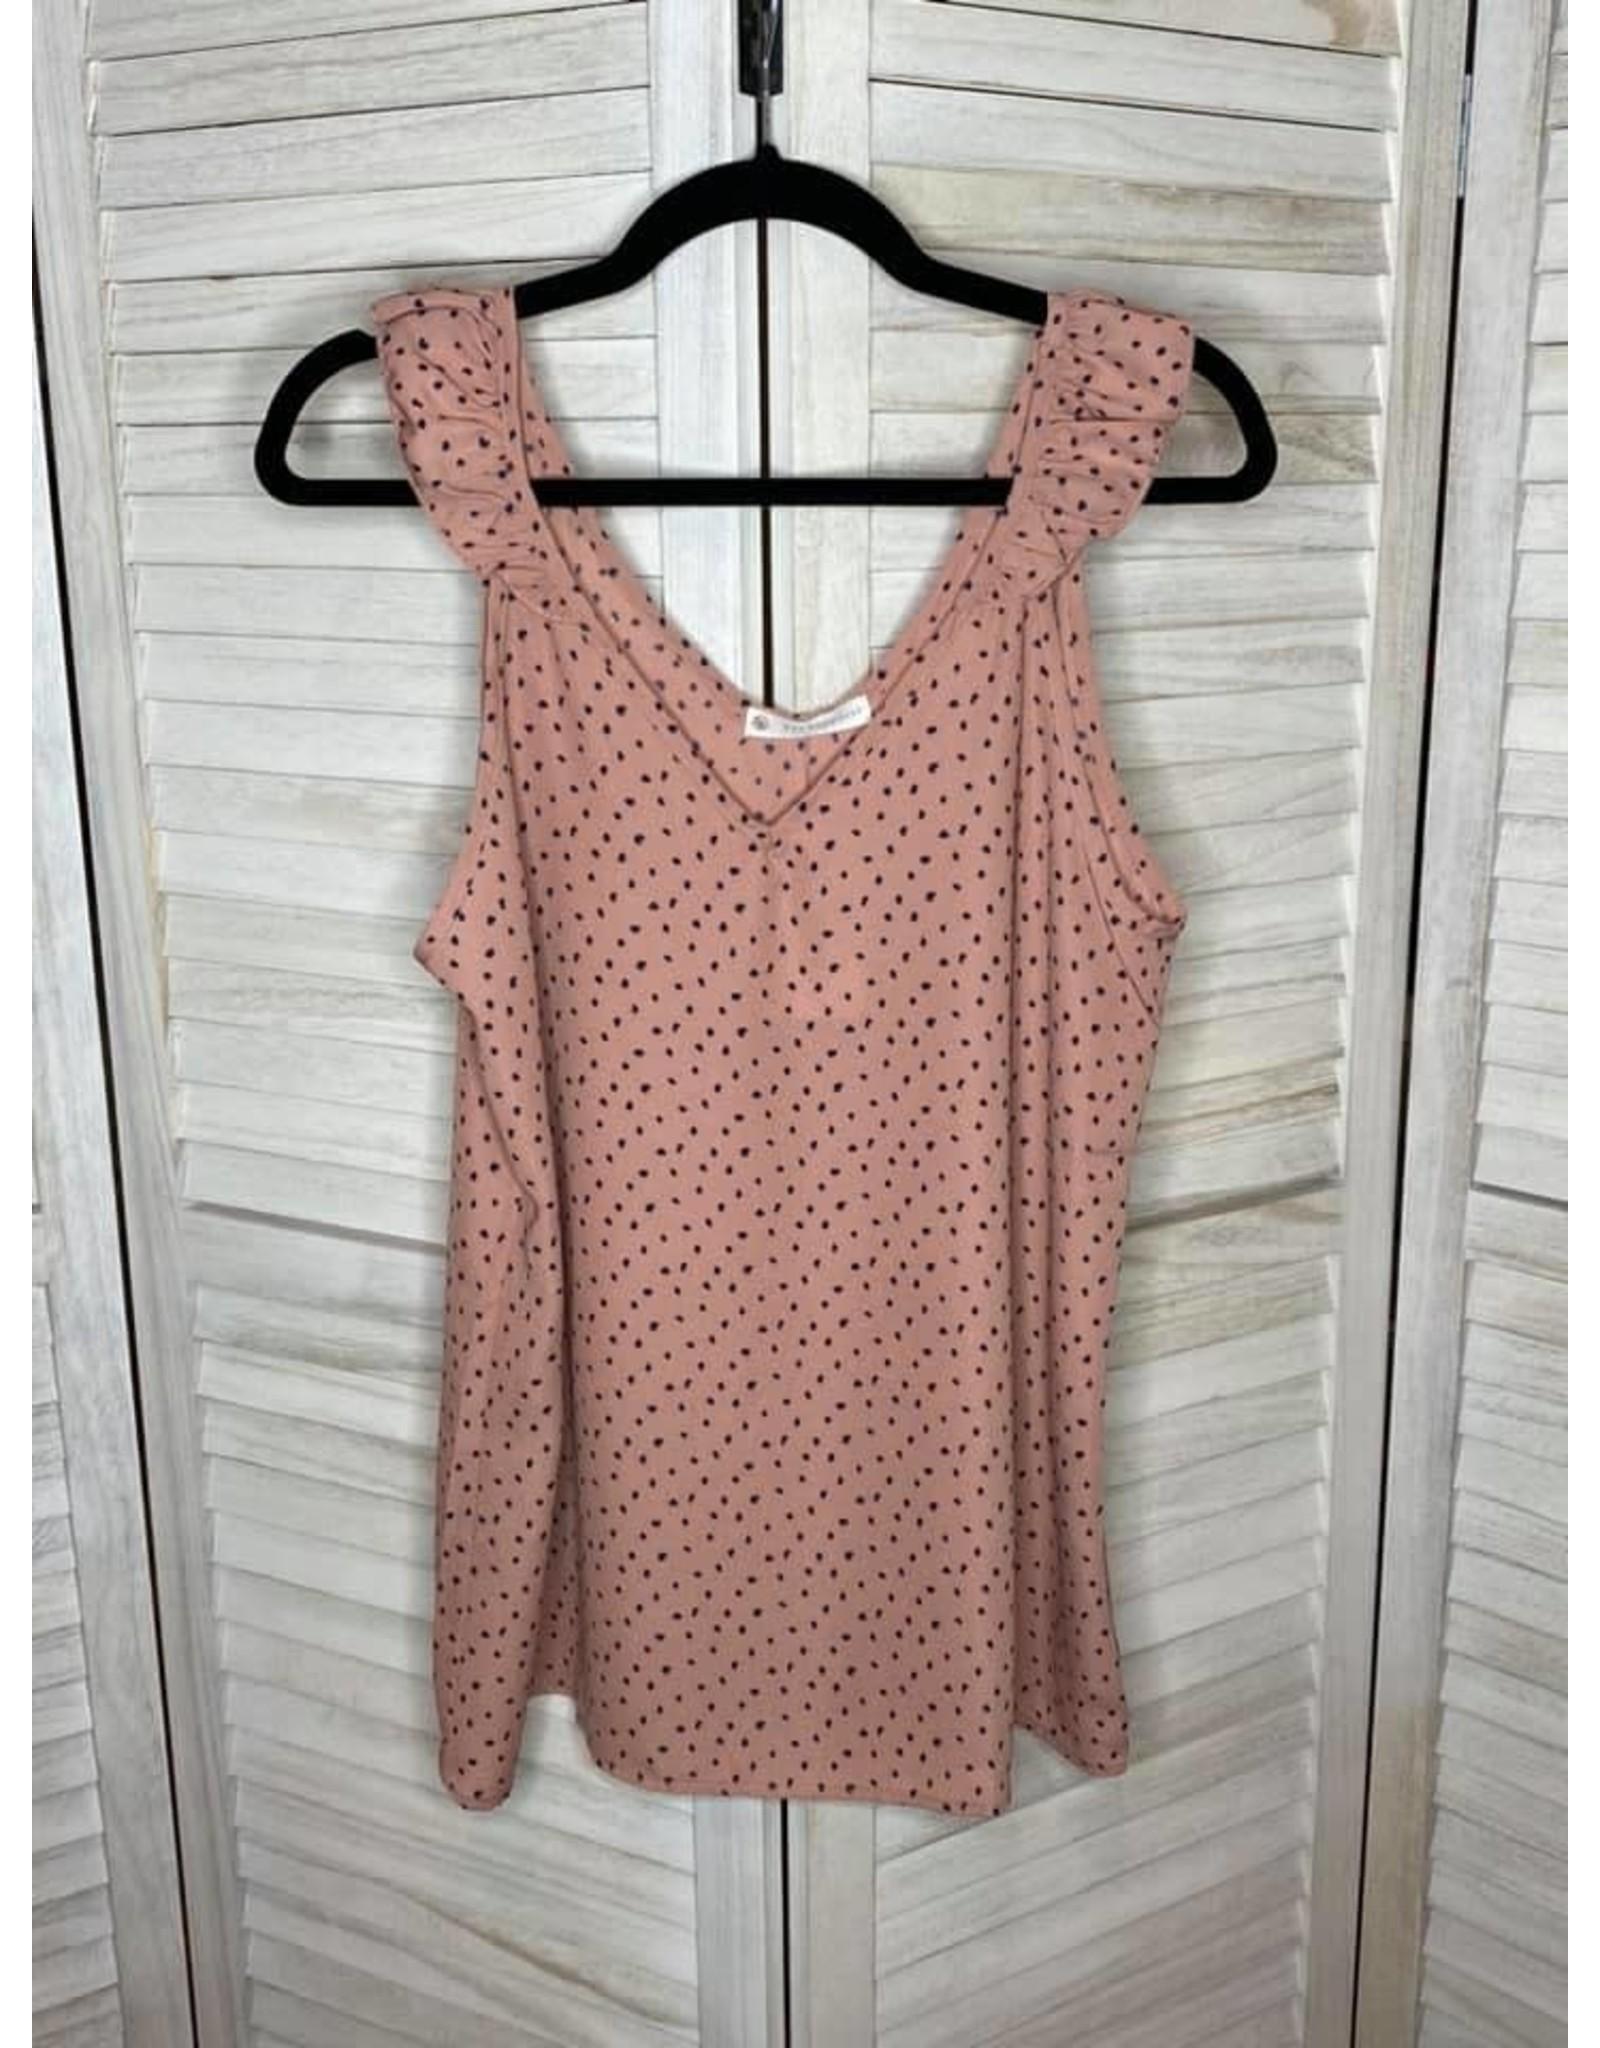 FSL Apparel FSL Dusty pink polka dot sleeveless top w/ruffle